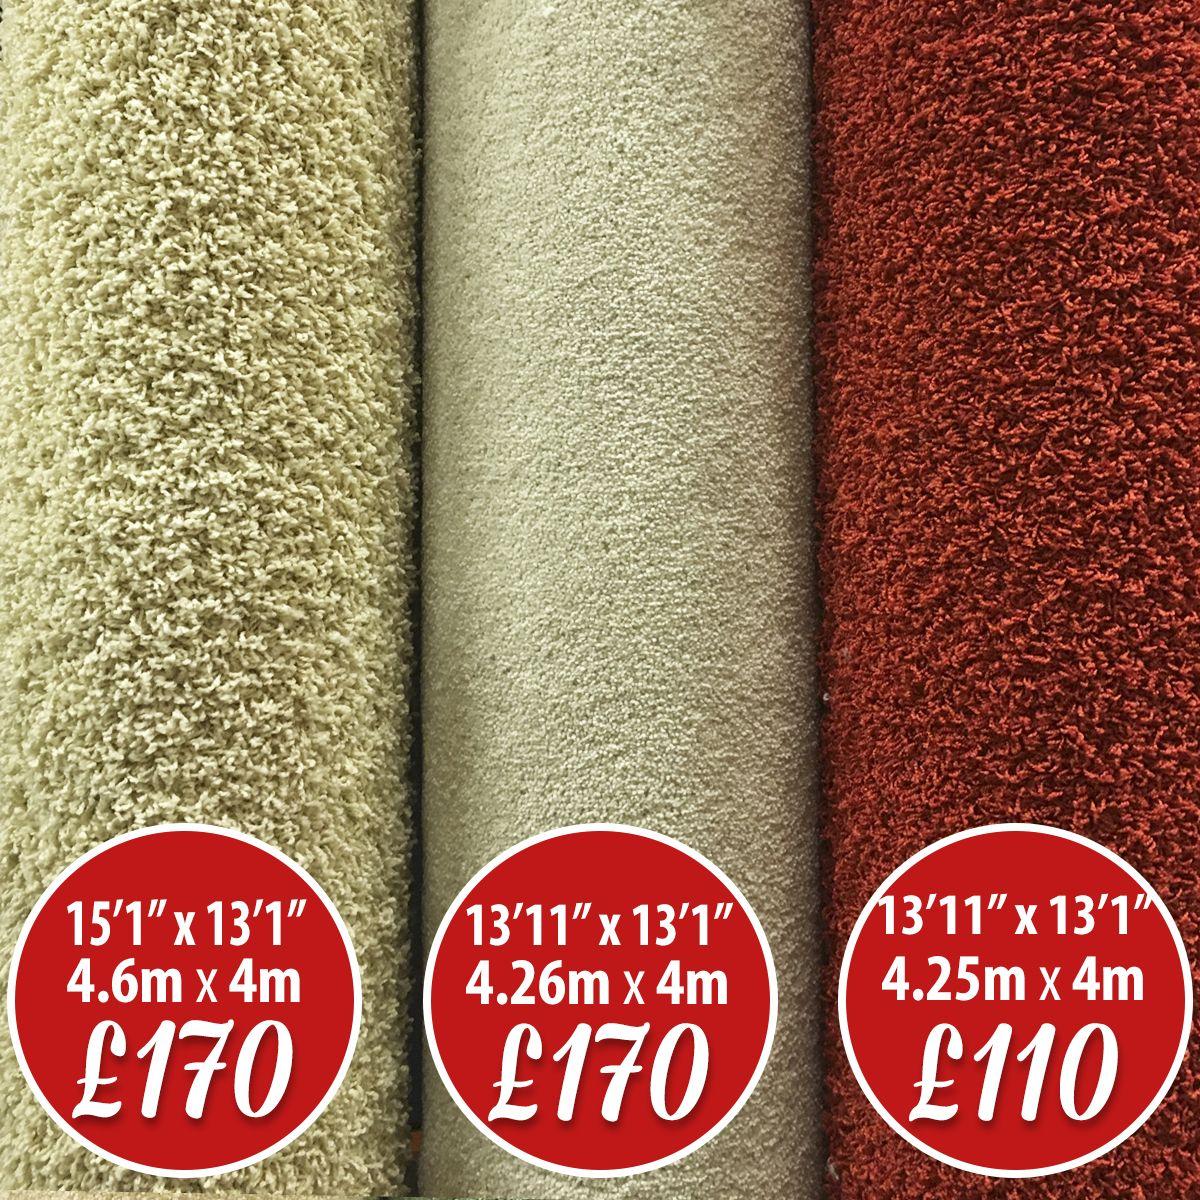 Carpet ROLL END SALE Cream Shaggy Carpet 46m x 4m 151 x